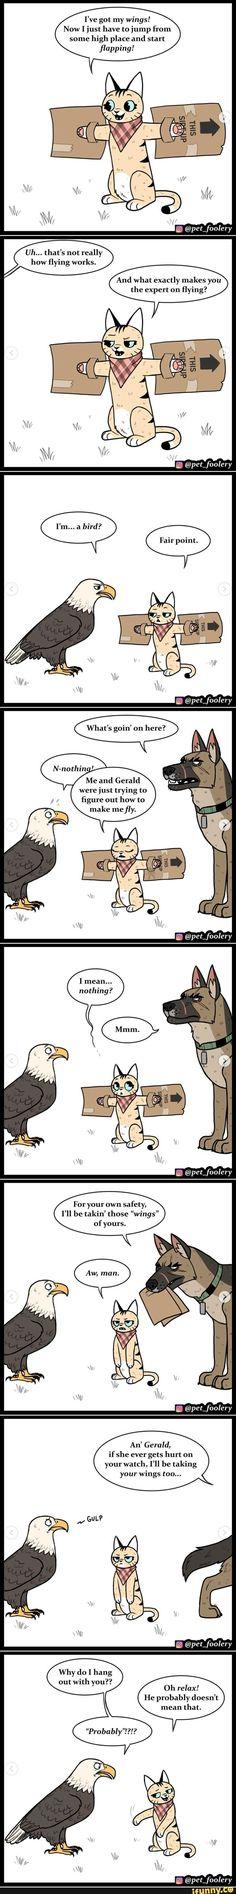 Funny Animal Comics, Animal Jokes, Cute Comics, Funny Animal Memes, Stupid Funny Memes, Funny Comics, Funny Animals, Cute Animals, Cute Funny Cartoons